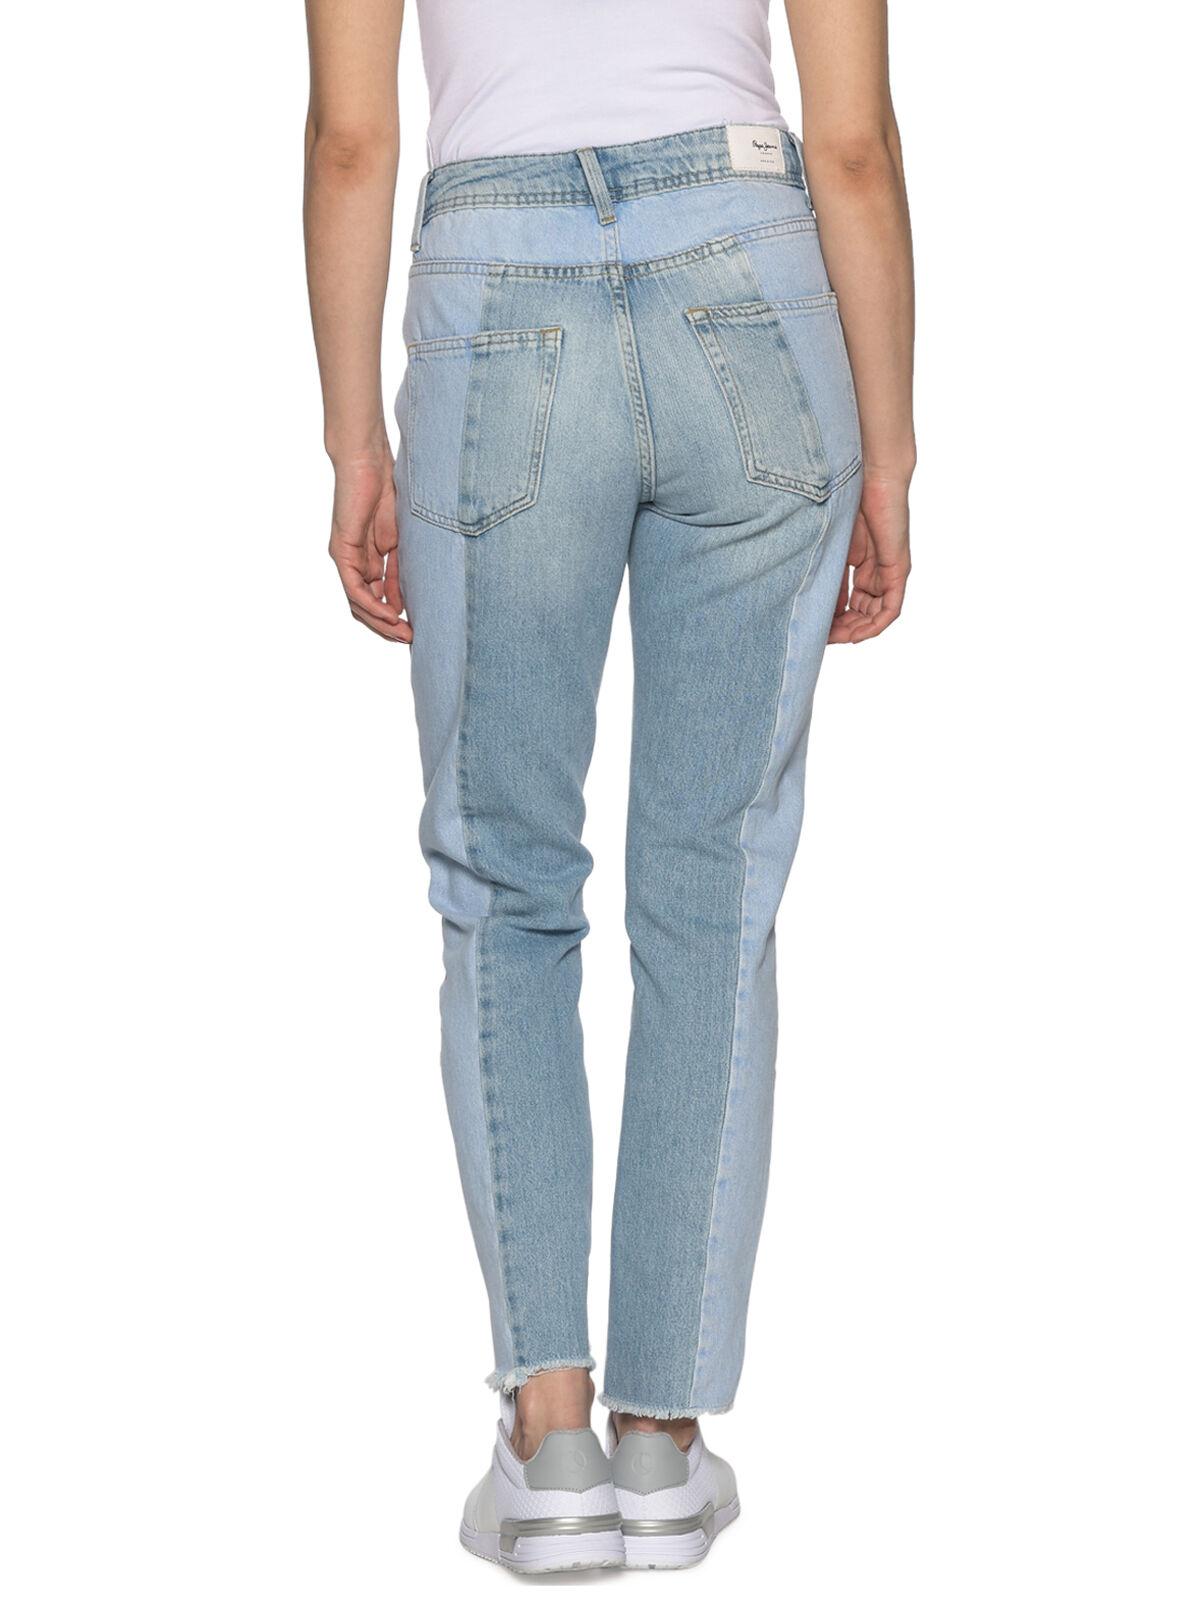 Vagabond Jeans